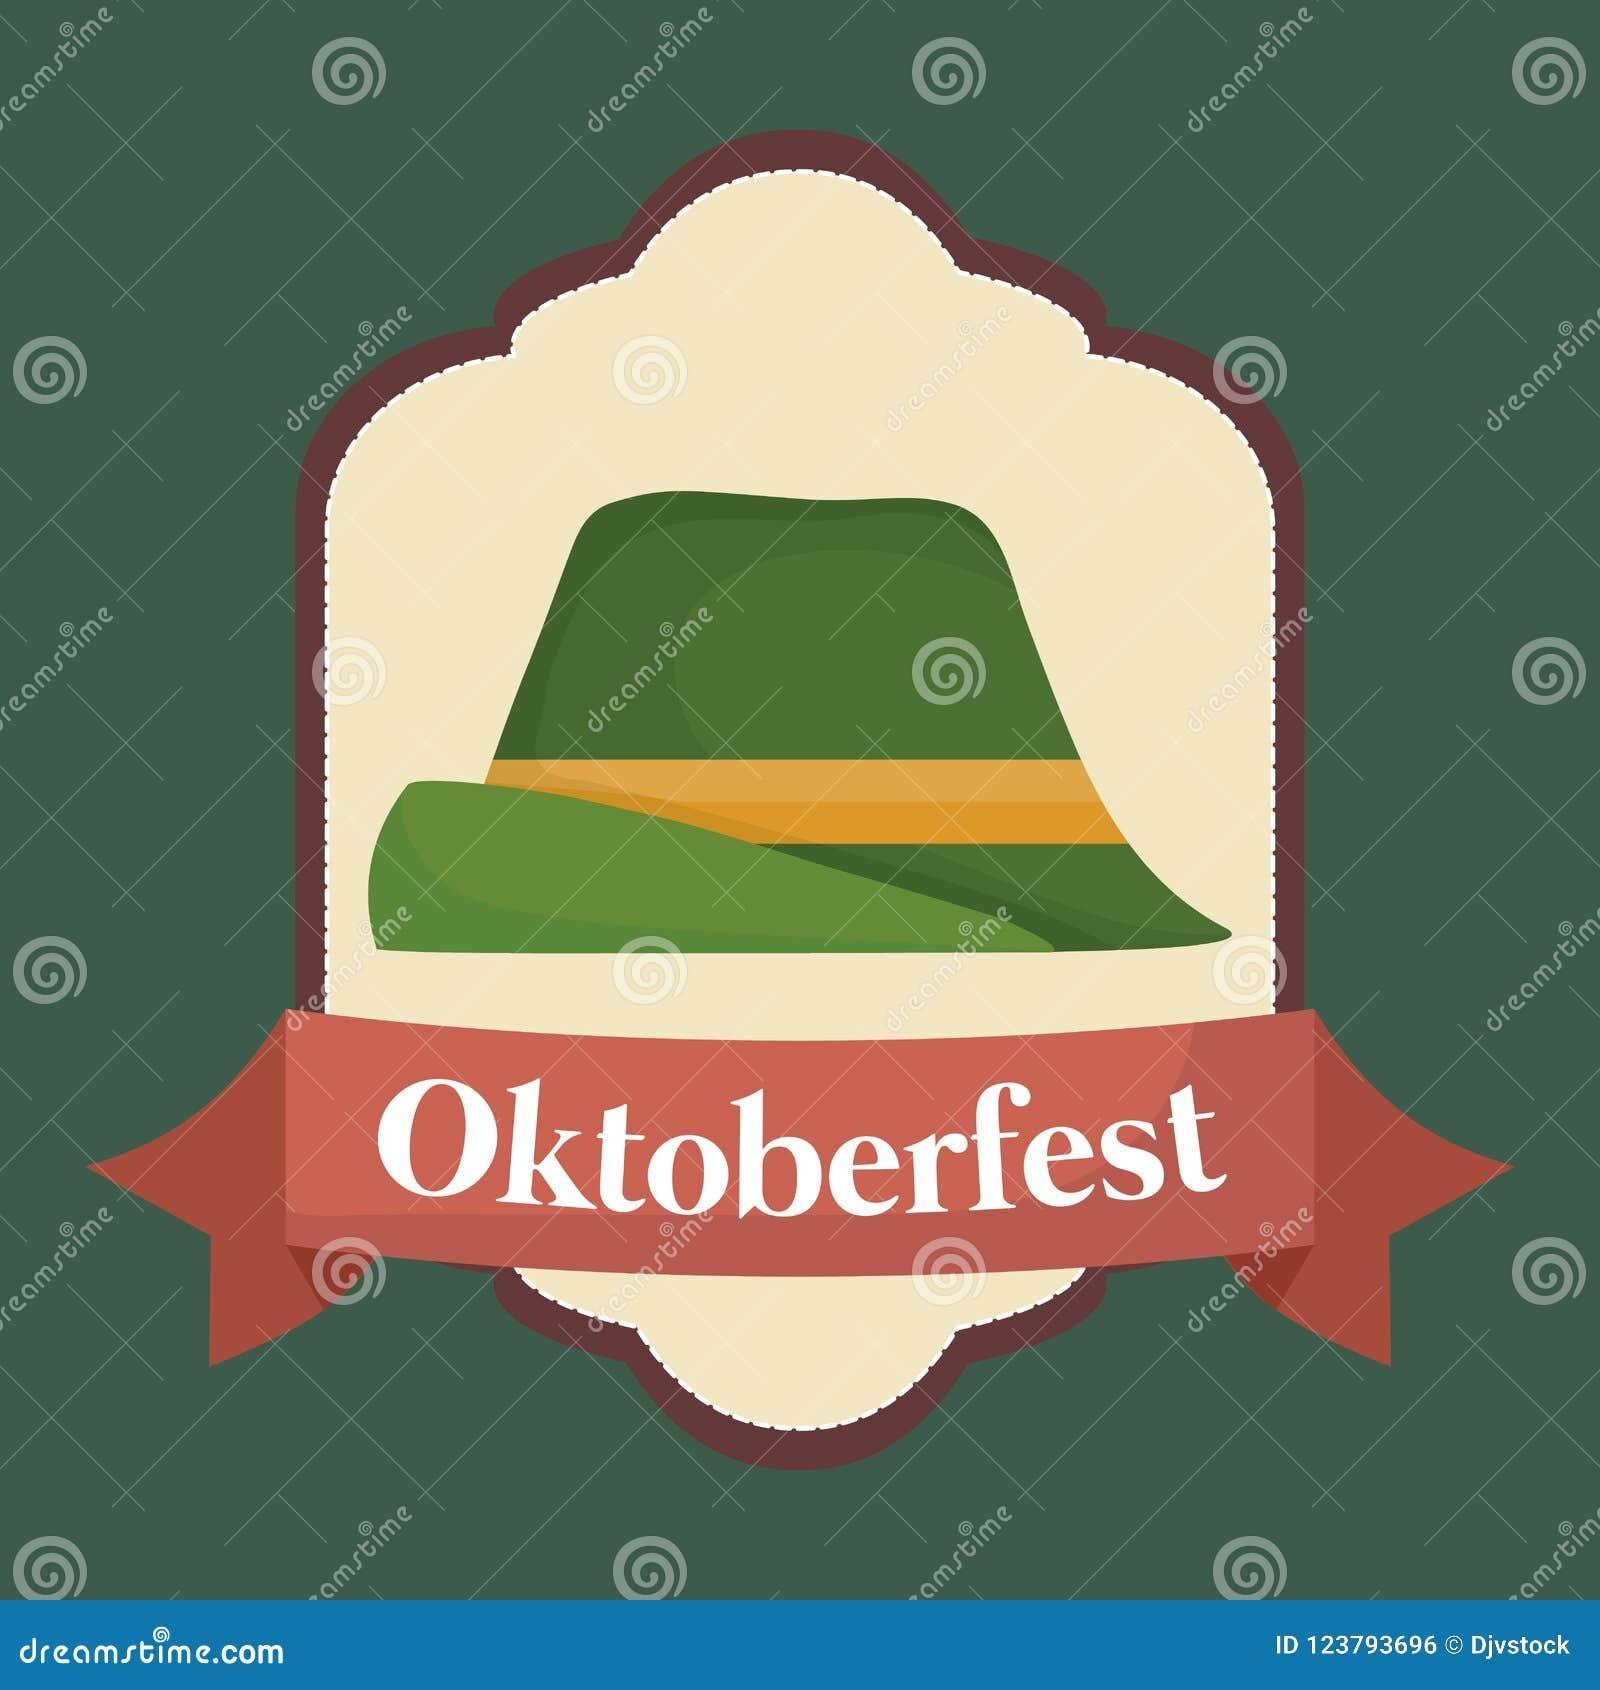 Oktoberfest festival emblem with alpine hat icon over green background 10a3e69b026